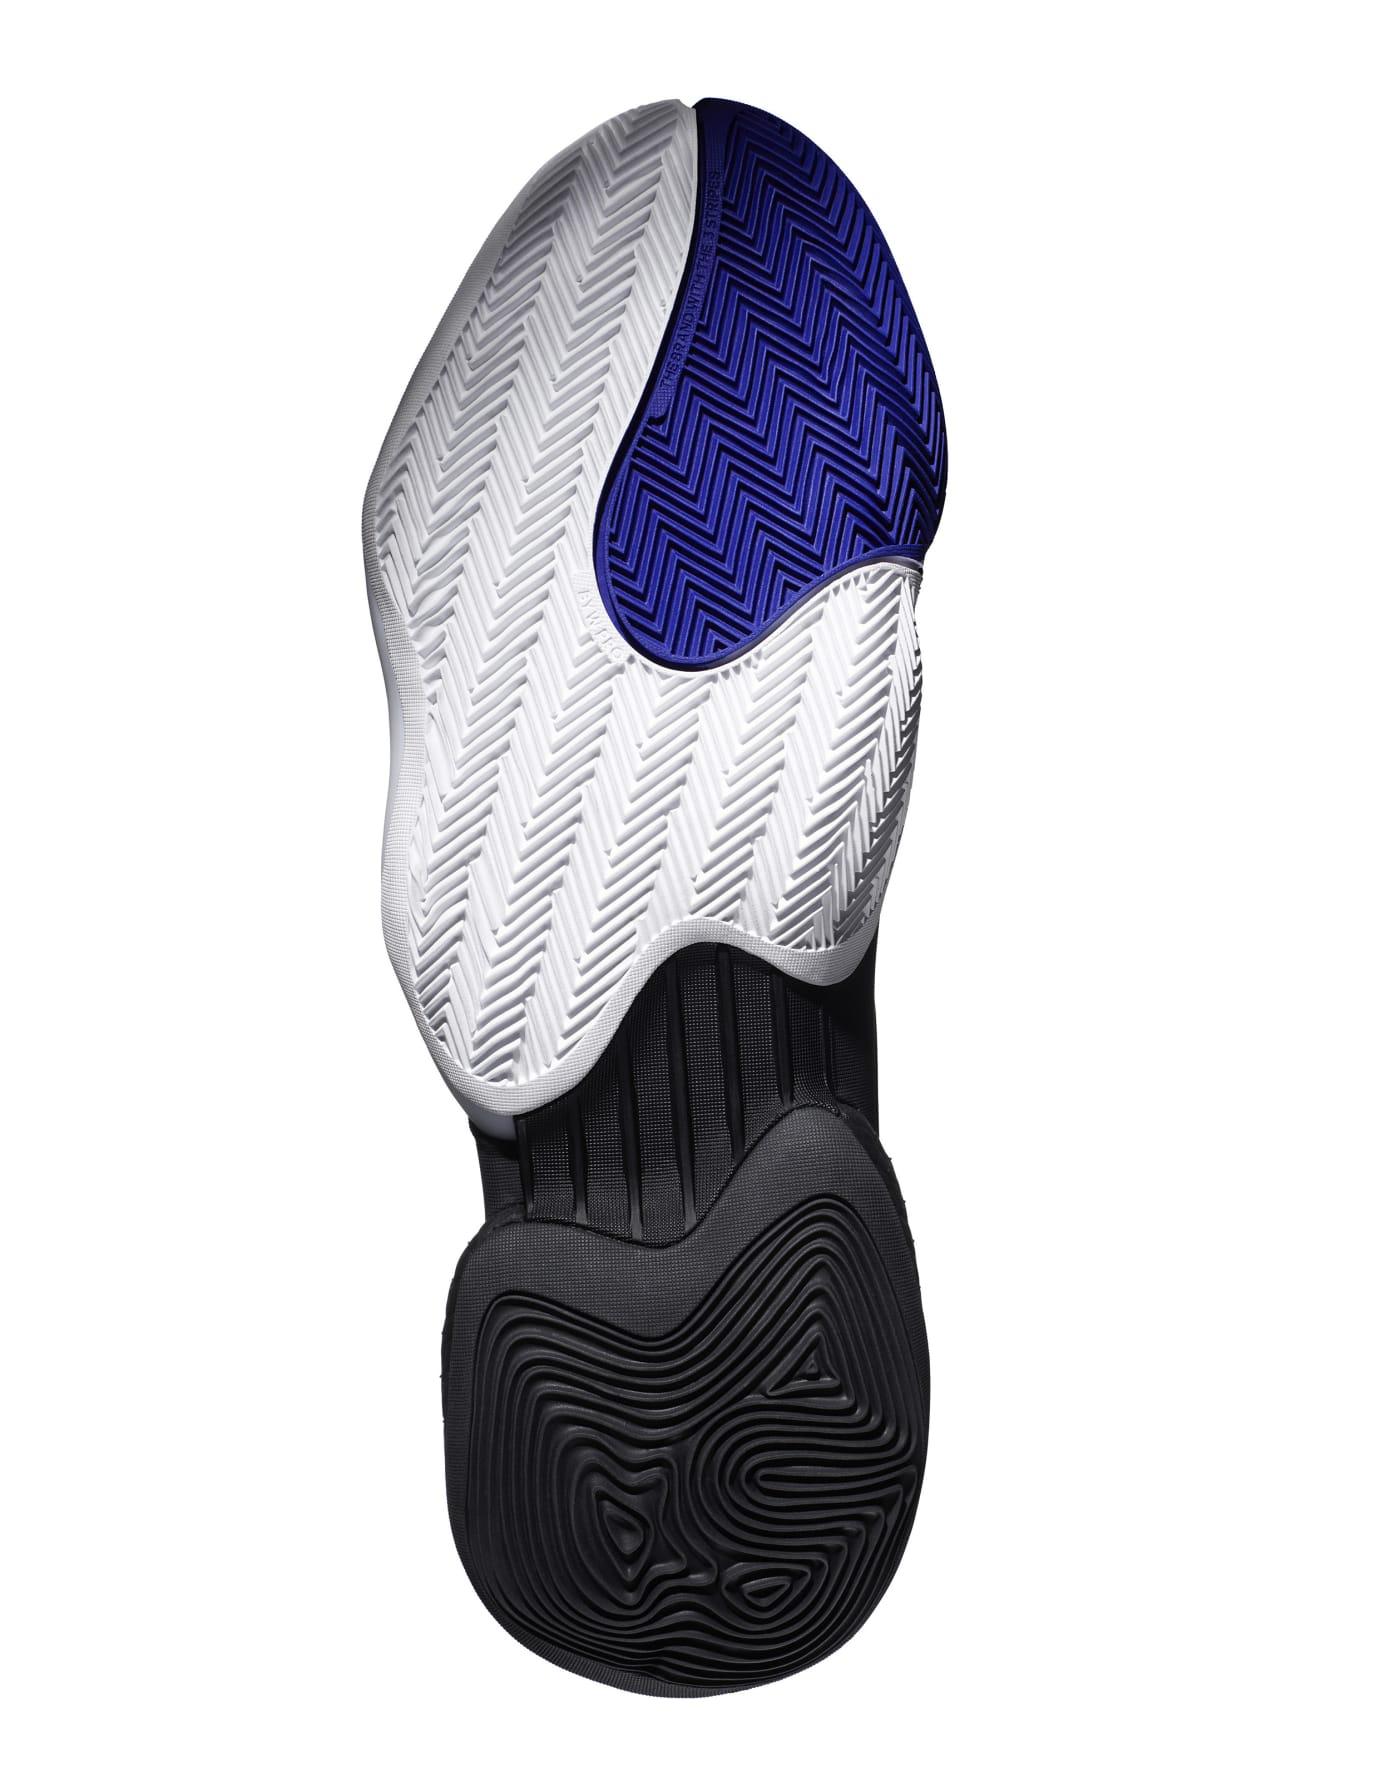 sports shoes 13b37 806dc Image via Adidas Adidas Crazy BYW X B41858 3